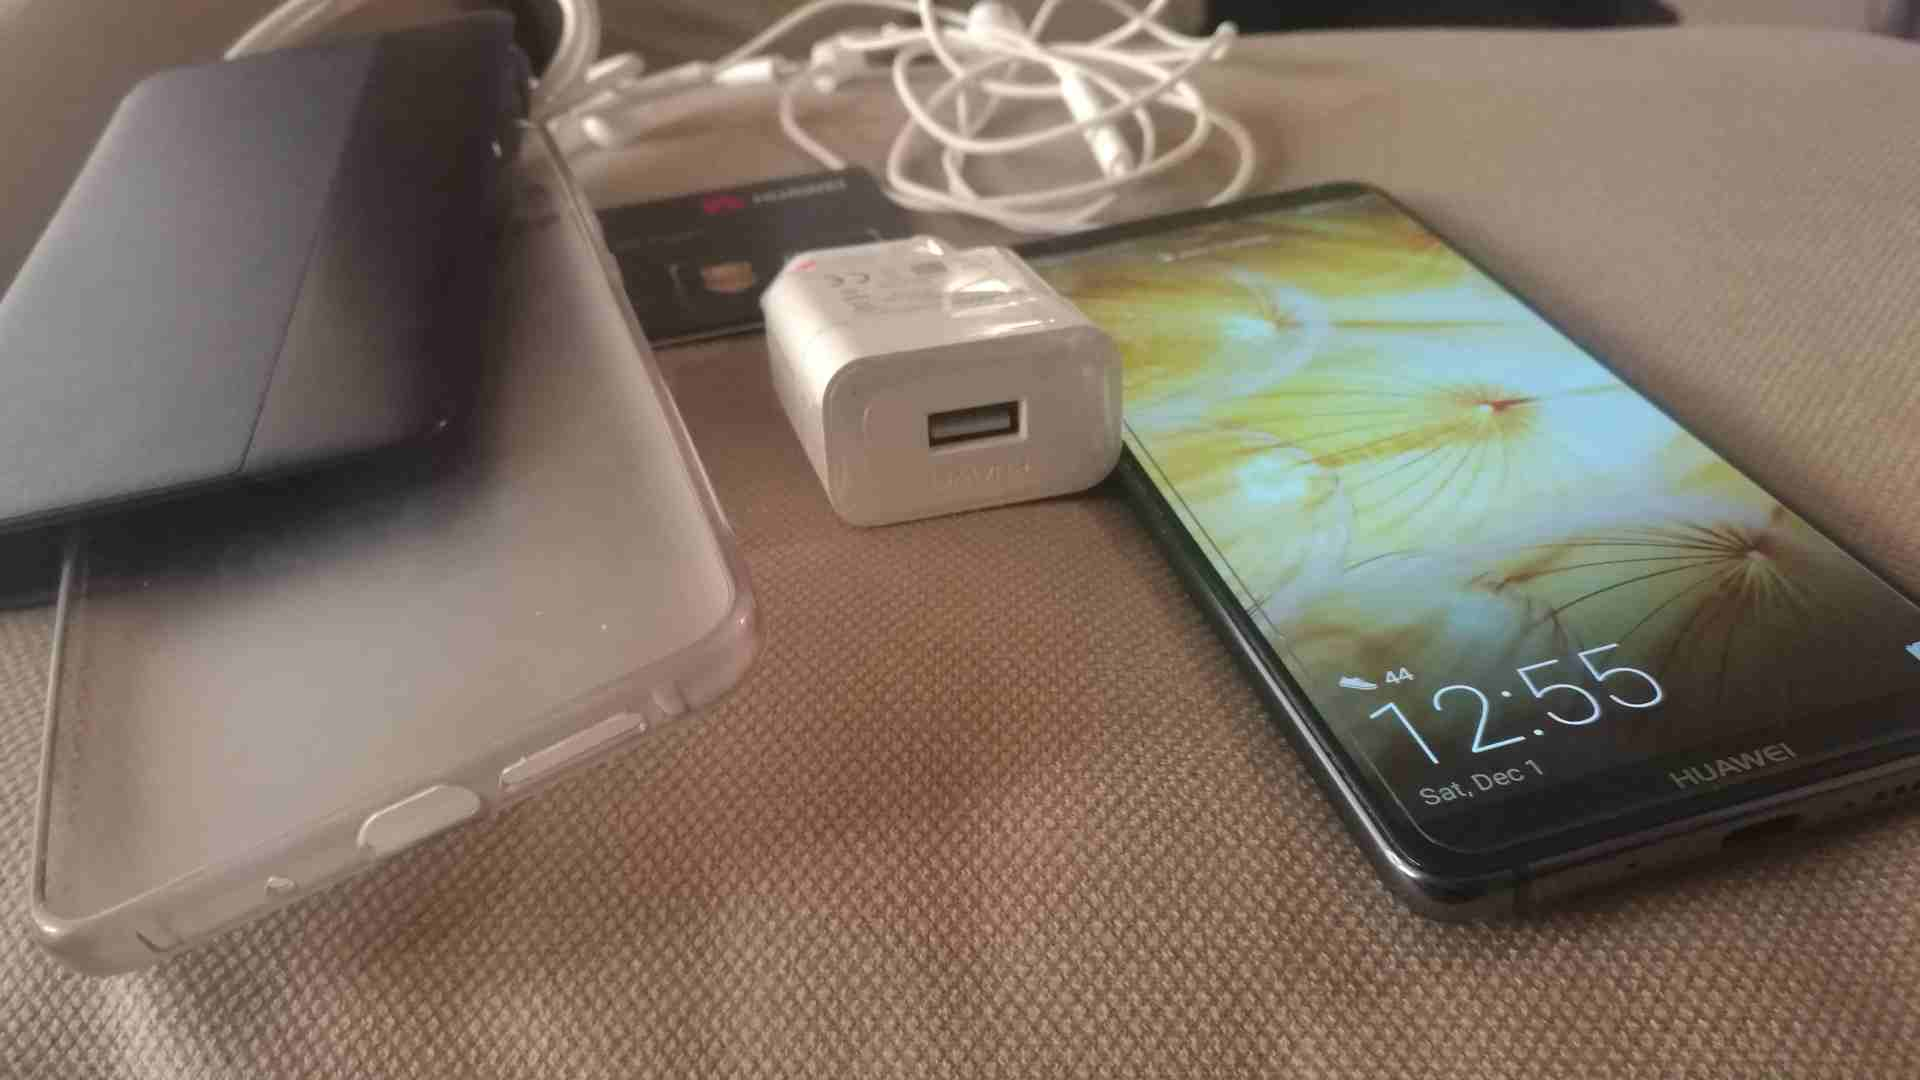 Apple iPhone 7 Plus 128GB( Free iWatch ) Free Shipping Delivery - Dhl , Fedex $350New OriginalApple iPhone 7+ Plus 128GB GSM Unlocked,Sim-Free warranty - Apple -  هواوي ميت 10 برو رام 6...